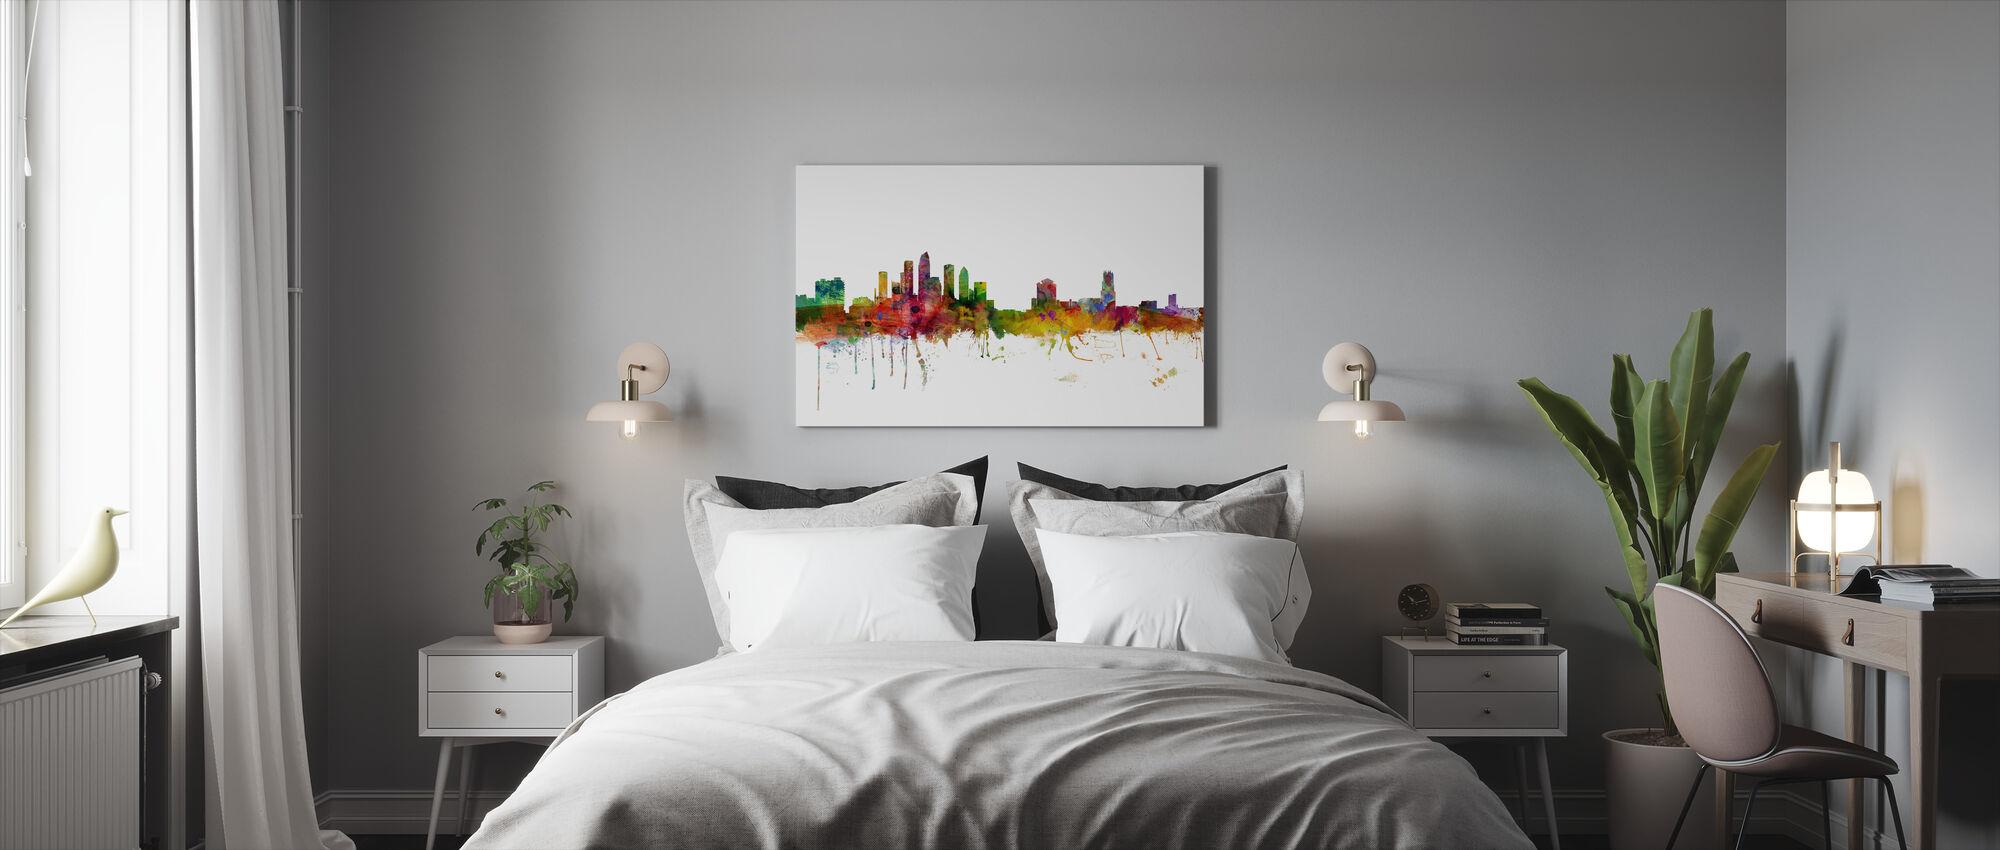 Tampa Florida Skyline - Canvas print - Bedroom